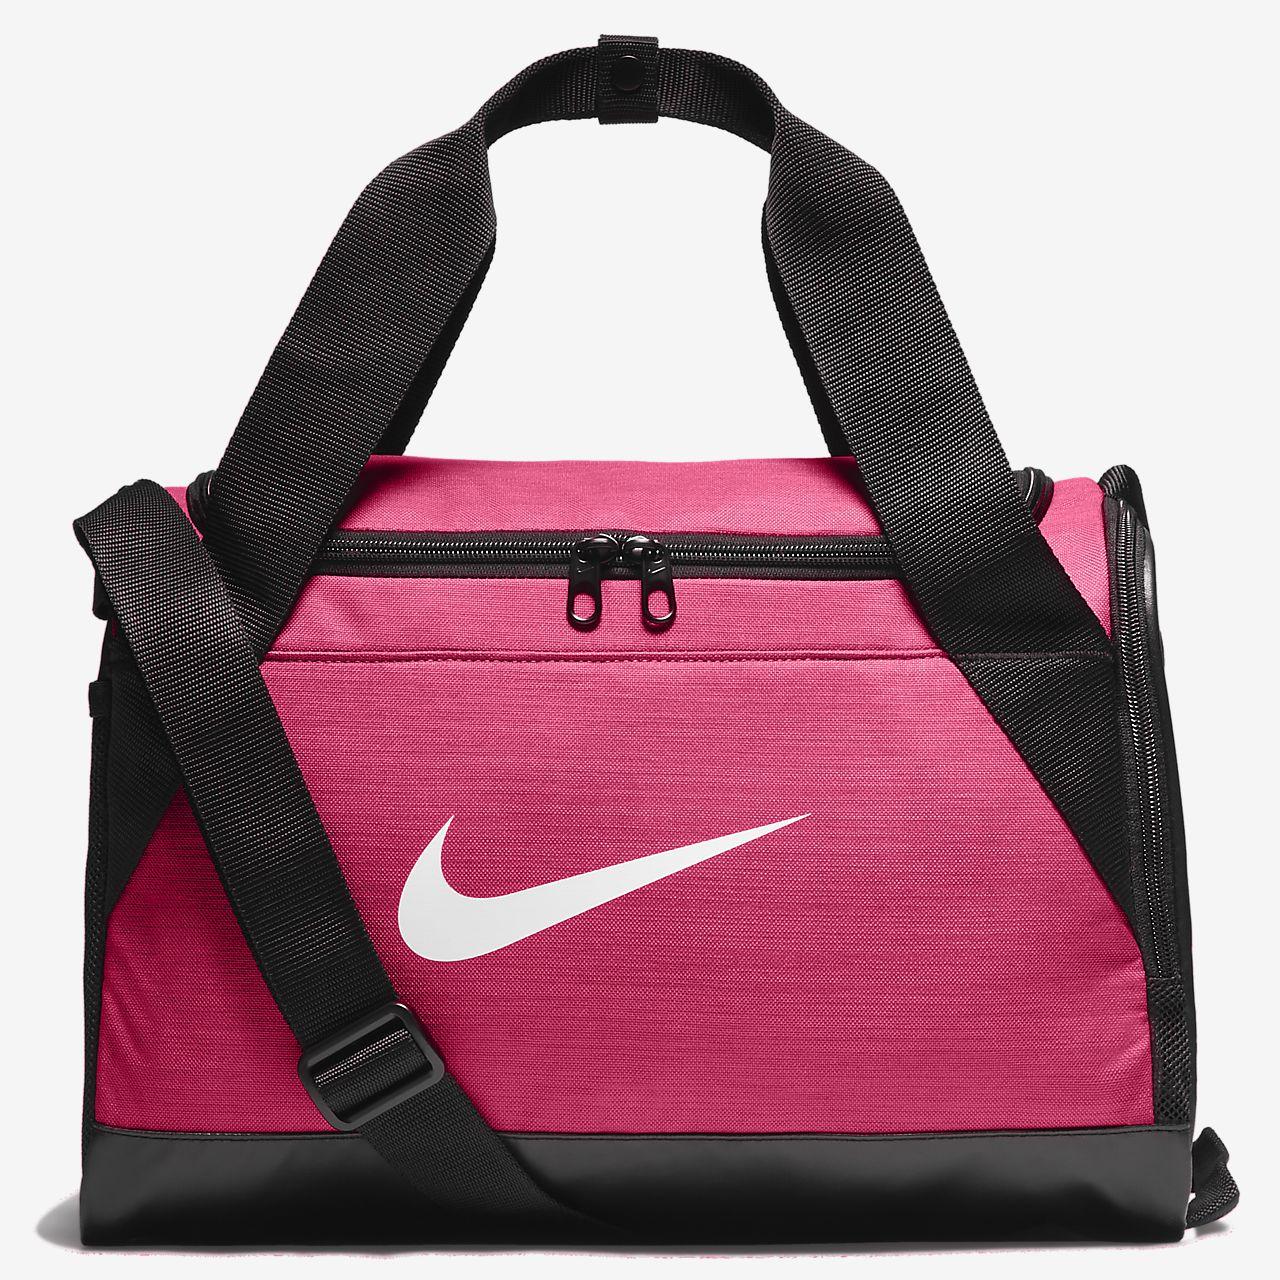 4207193aa8 ... Τσάντα γυμναστηρίου για προπόνηση Nike Brasilia (μέγεθος Extra Small)